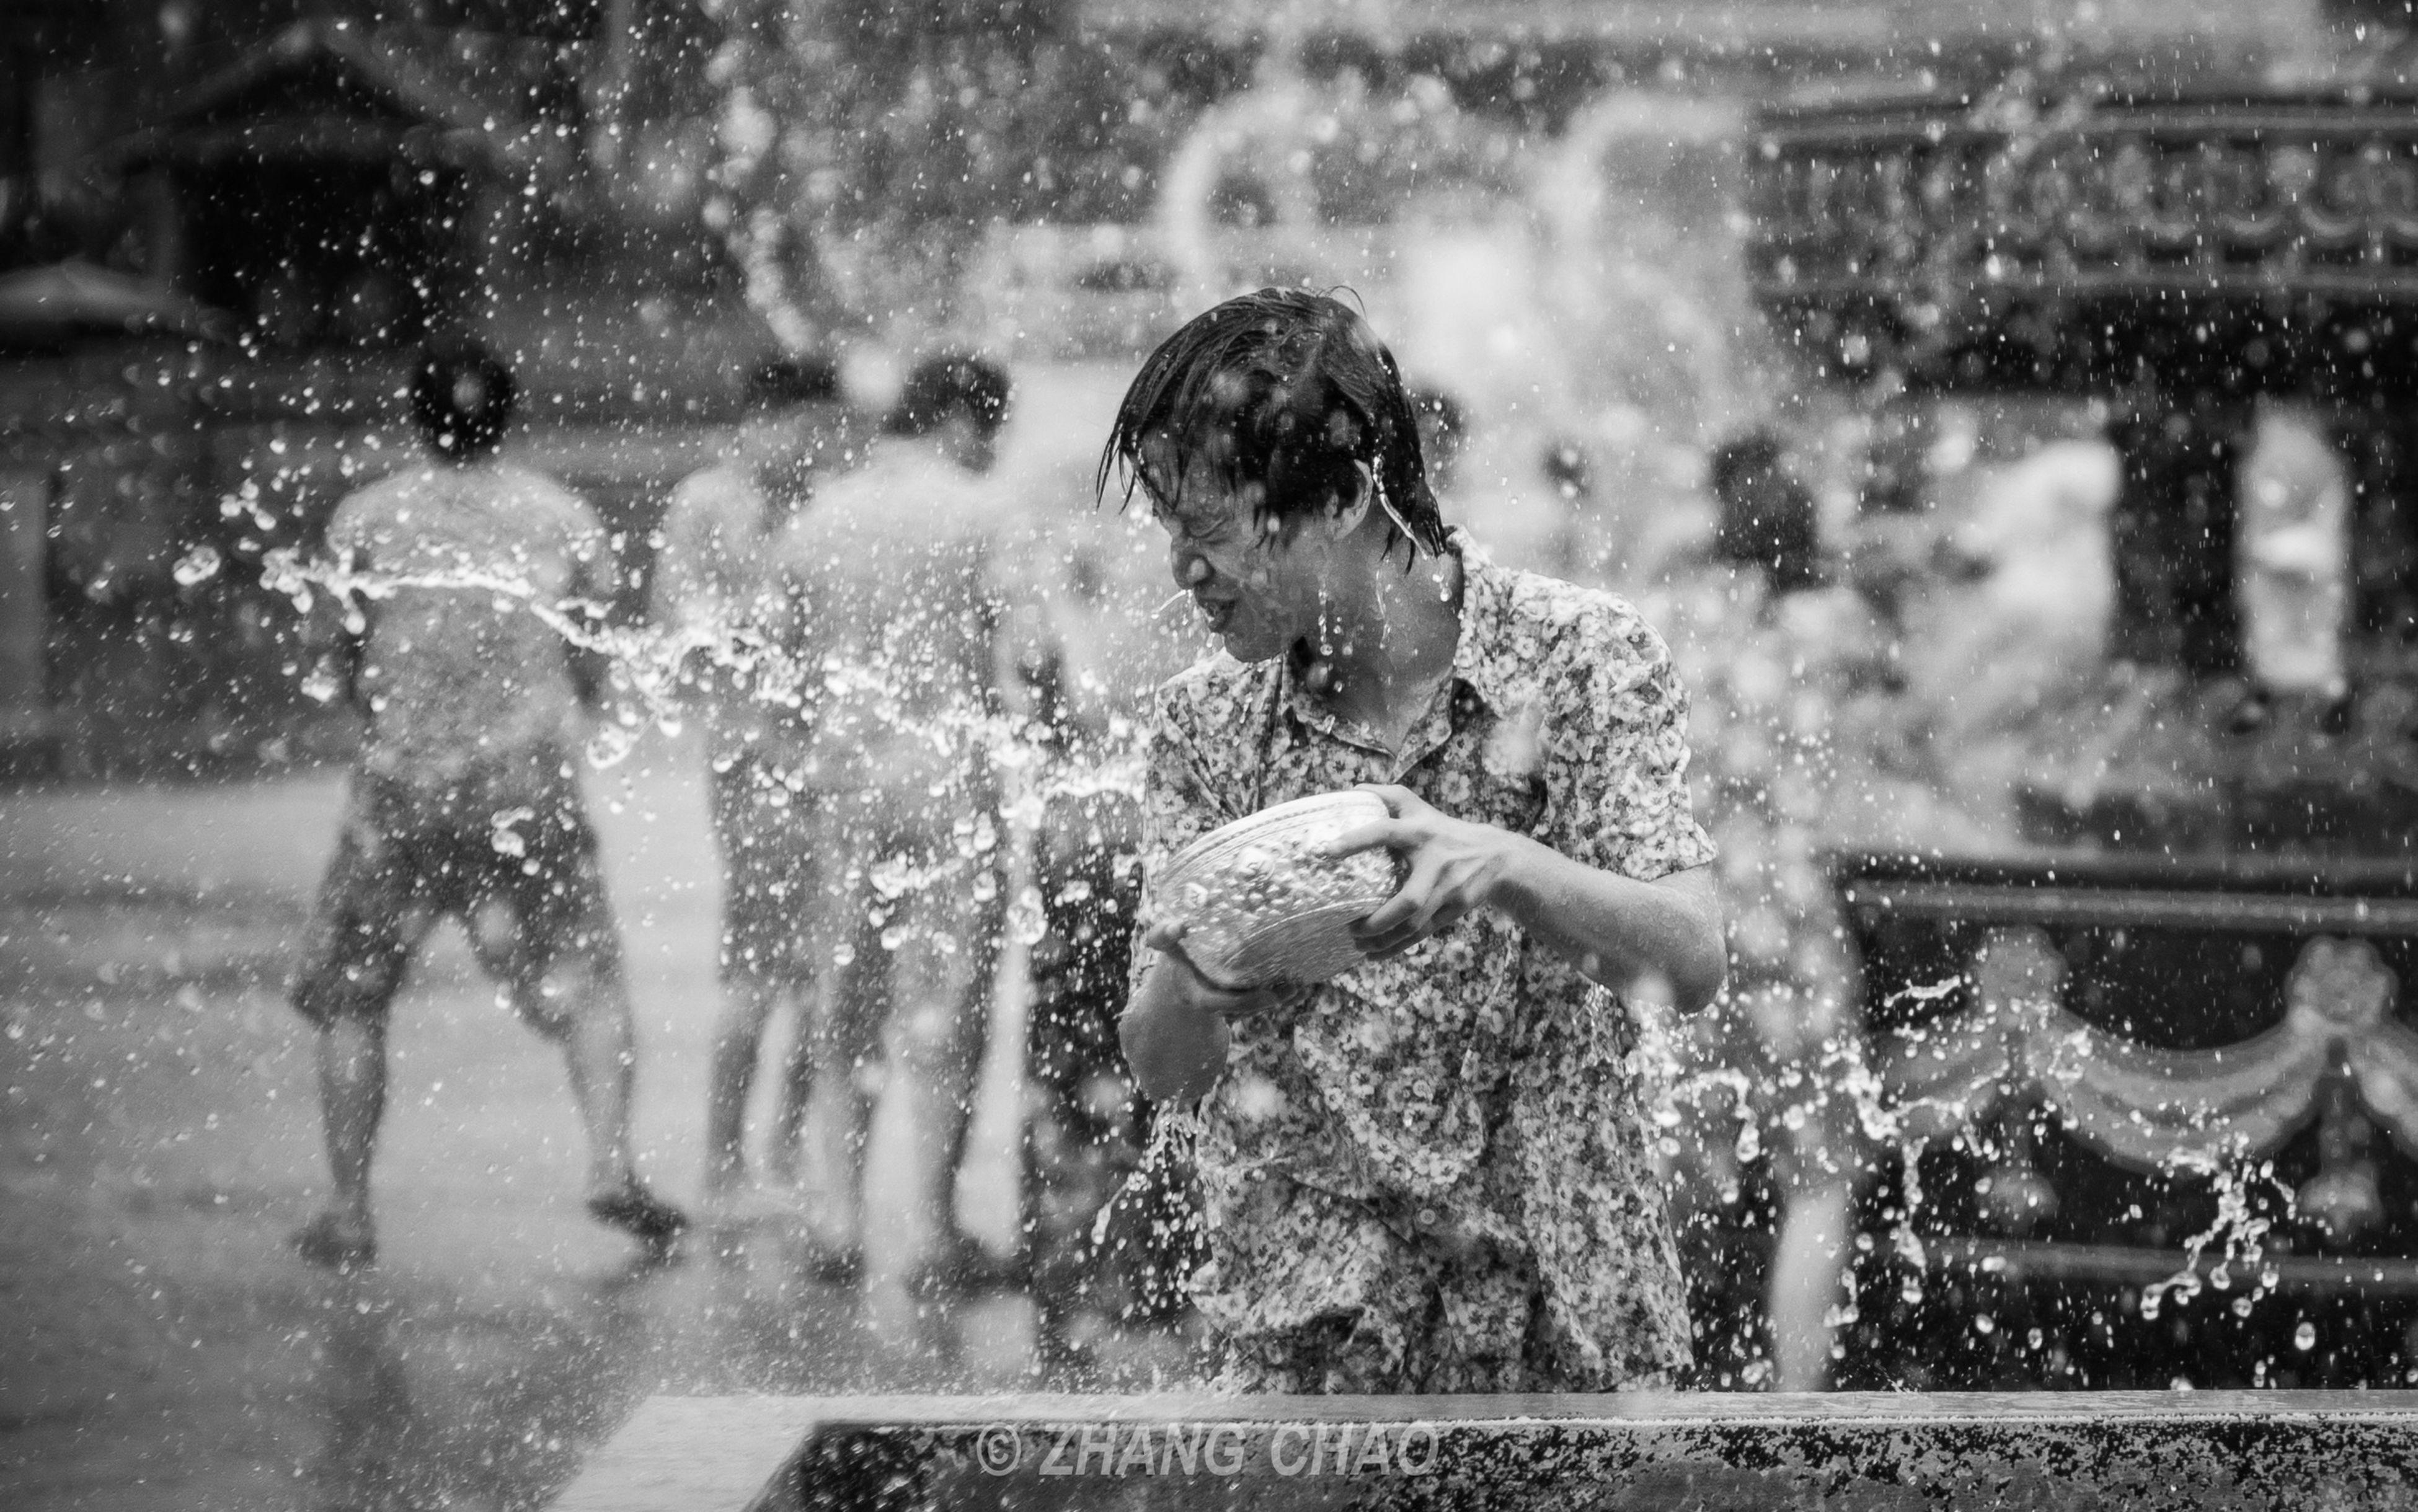 lifestyles, leisure activity, water, motion, wet, splashing, enjoyment, fountain, season, men, spraying, blurred motion, rain, weather, drop, fun, person, boys